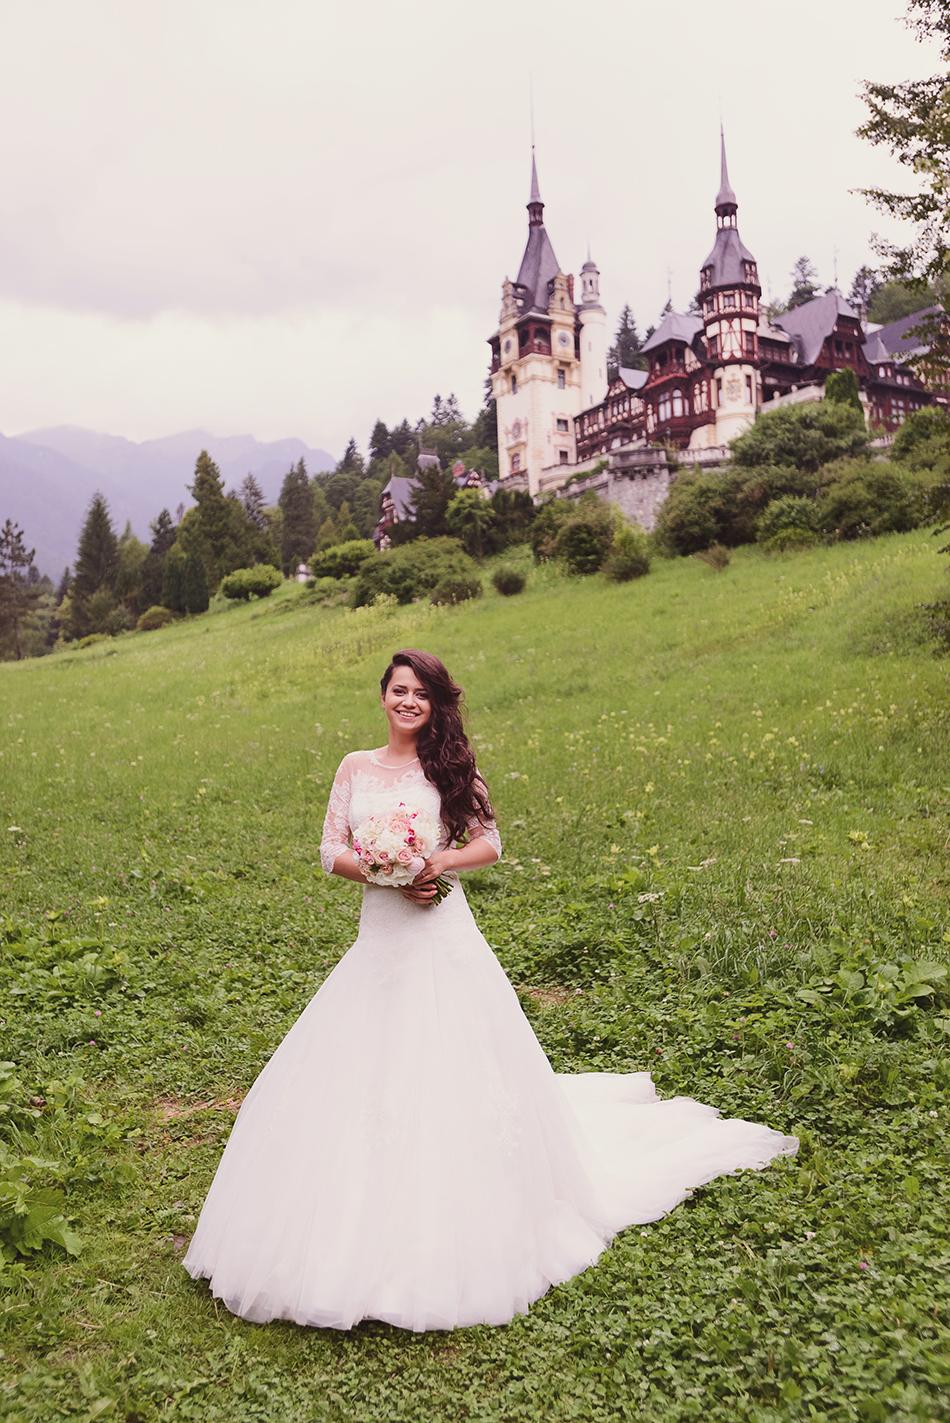 AD Passion Photography | fotograf-nunta-bucuresti_lorena-si-ammadeuss_0098 | Adelin, Dida, fotograf profesionist, fotograf de nunta, fotografie de nunta, fotograf Timisoara, fotograf Craiova, fotograf Bucuresti, fotograf Arad, nunta Timisoara, nunta Arad, nunta Bucuresti, nunta Craiova